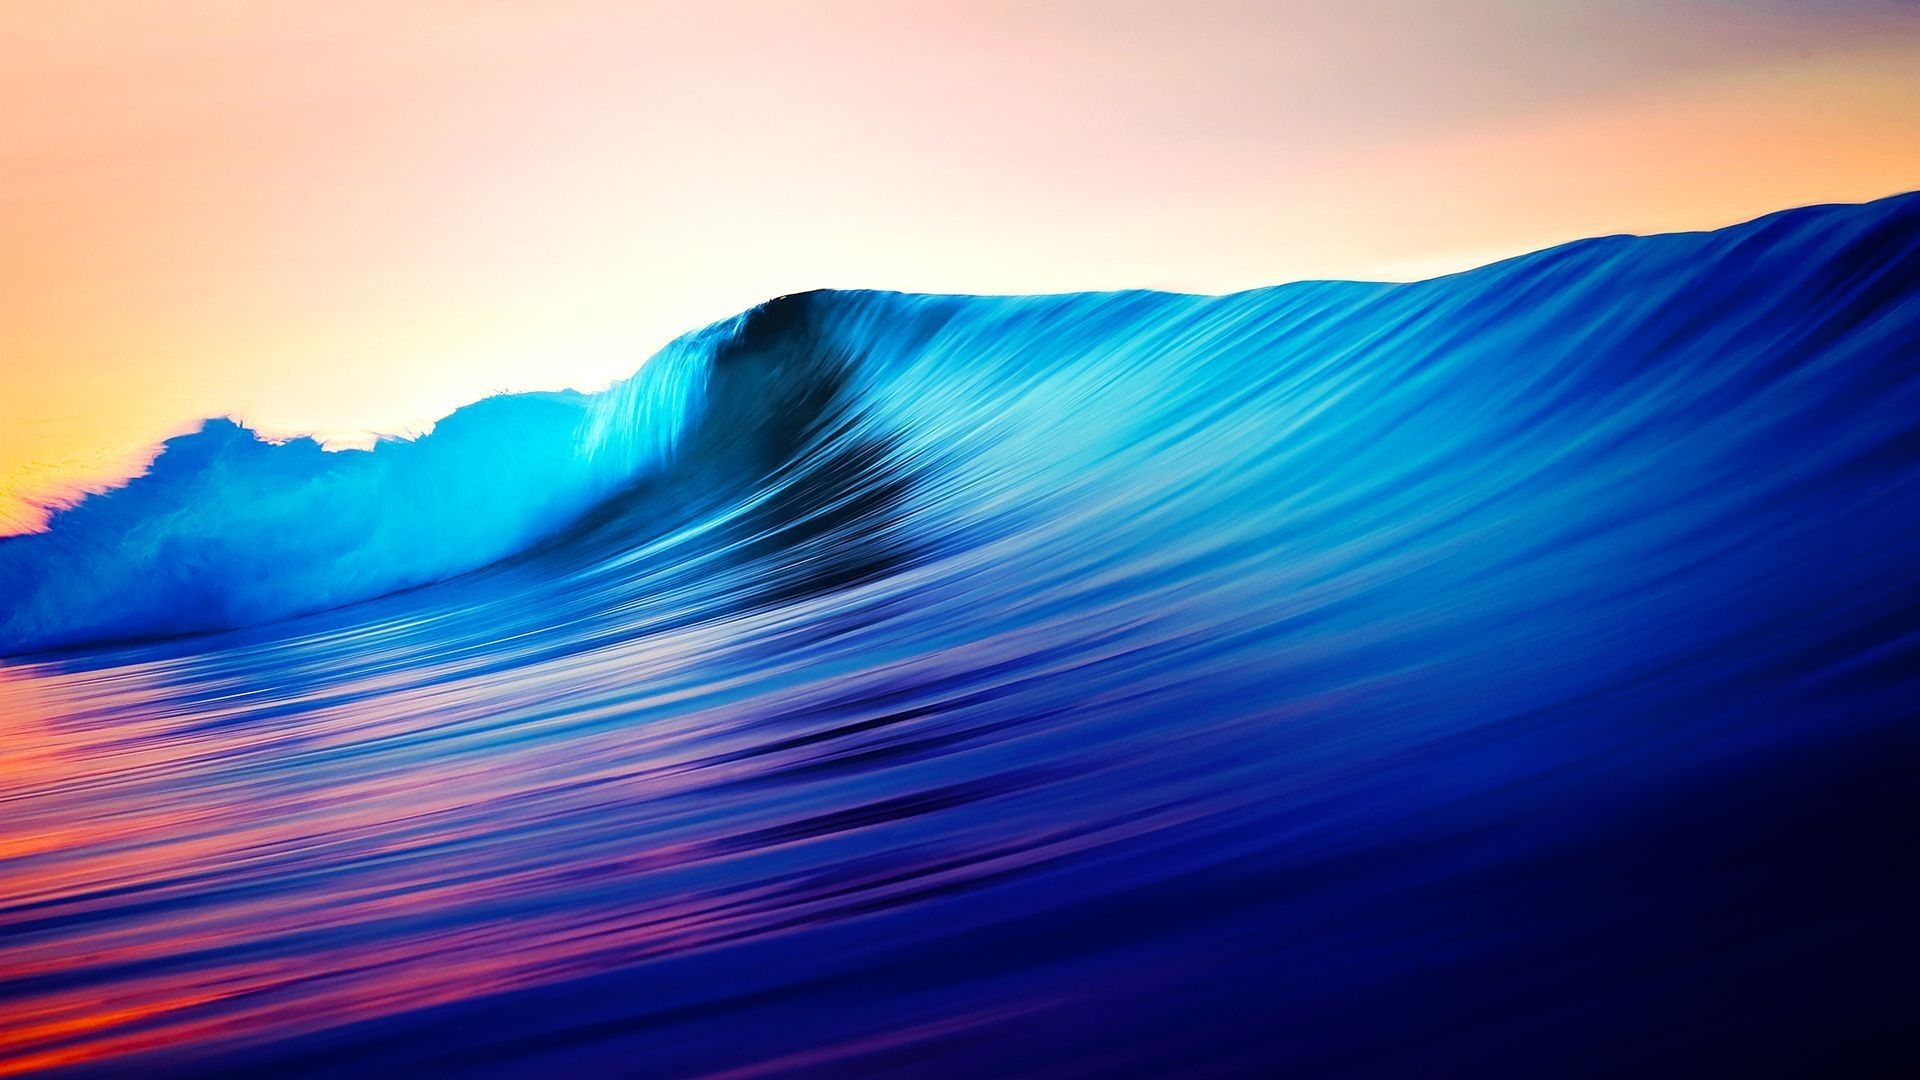 Res: 1920x1080, Beautiful Oceans Sea Shiny Waves Nature Ocean Wallpaper Ios -